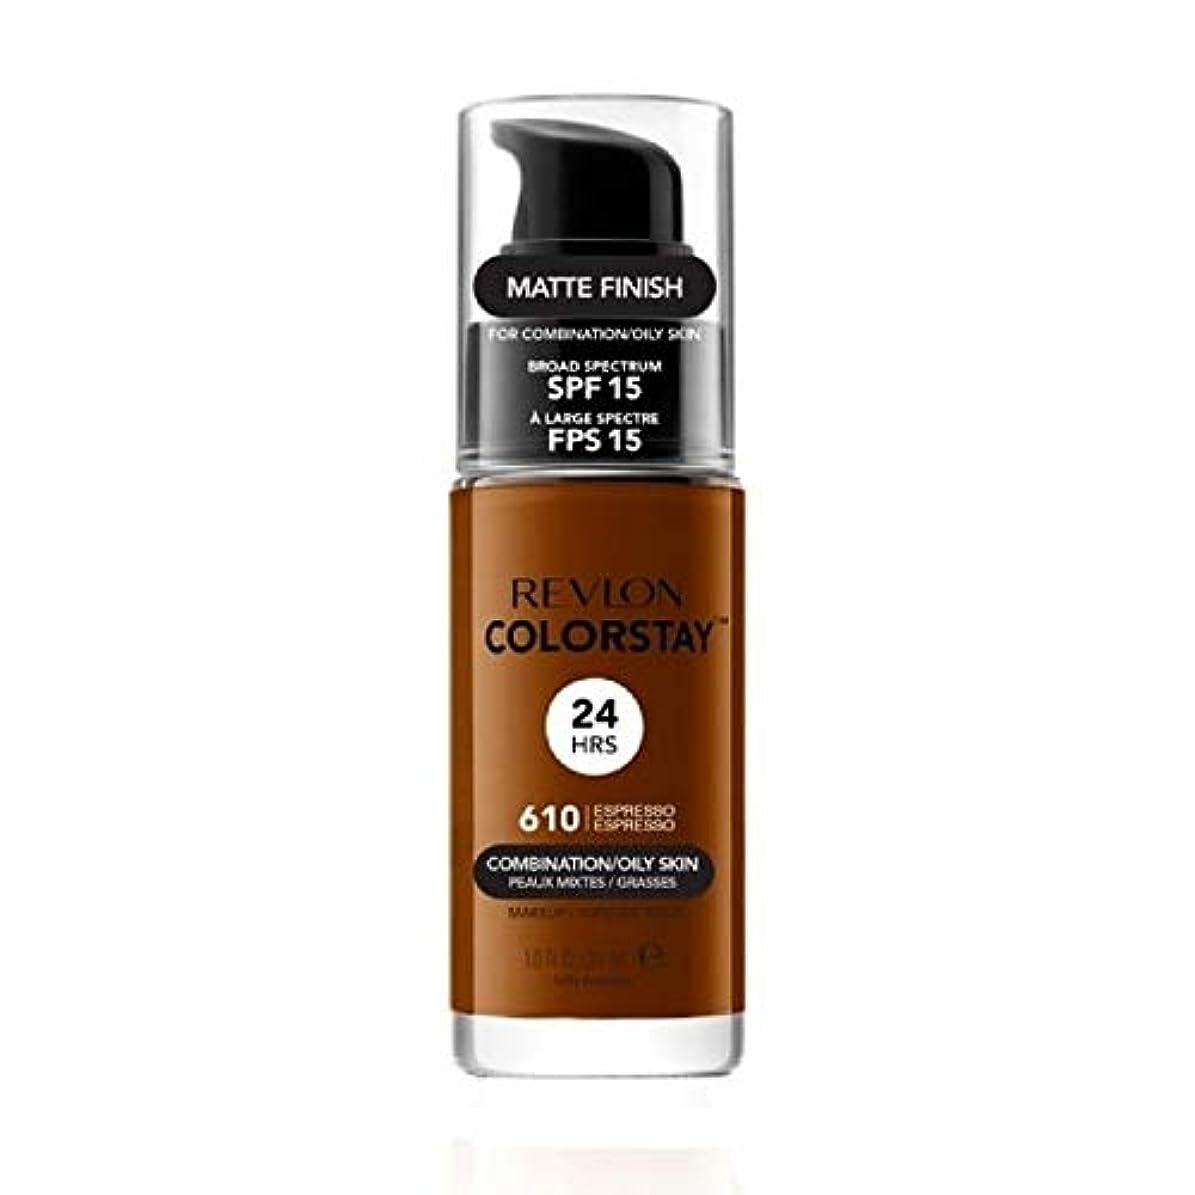 [Revlon ] レブロンColorstayの基盤コンビオイリー肌の30ミリリットルのエスプレッソ - Revlon Colorstay Foundation Combi Oily skin 30ml Espresso...